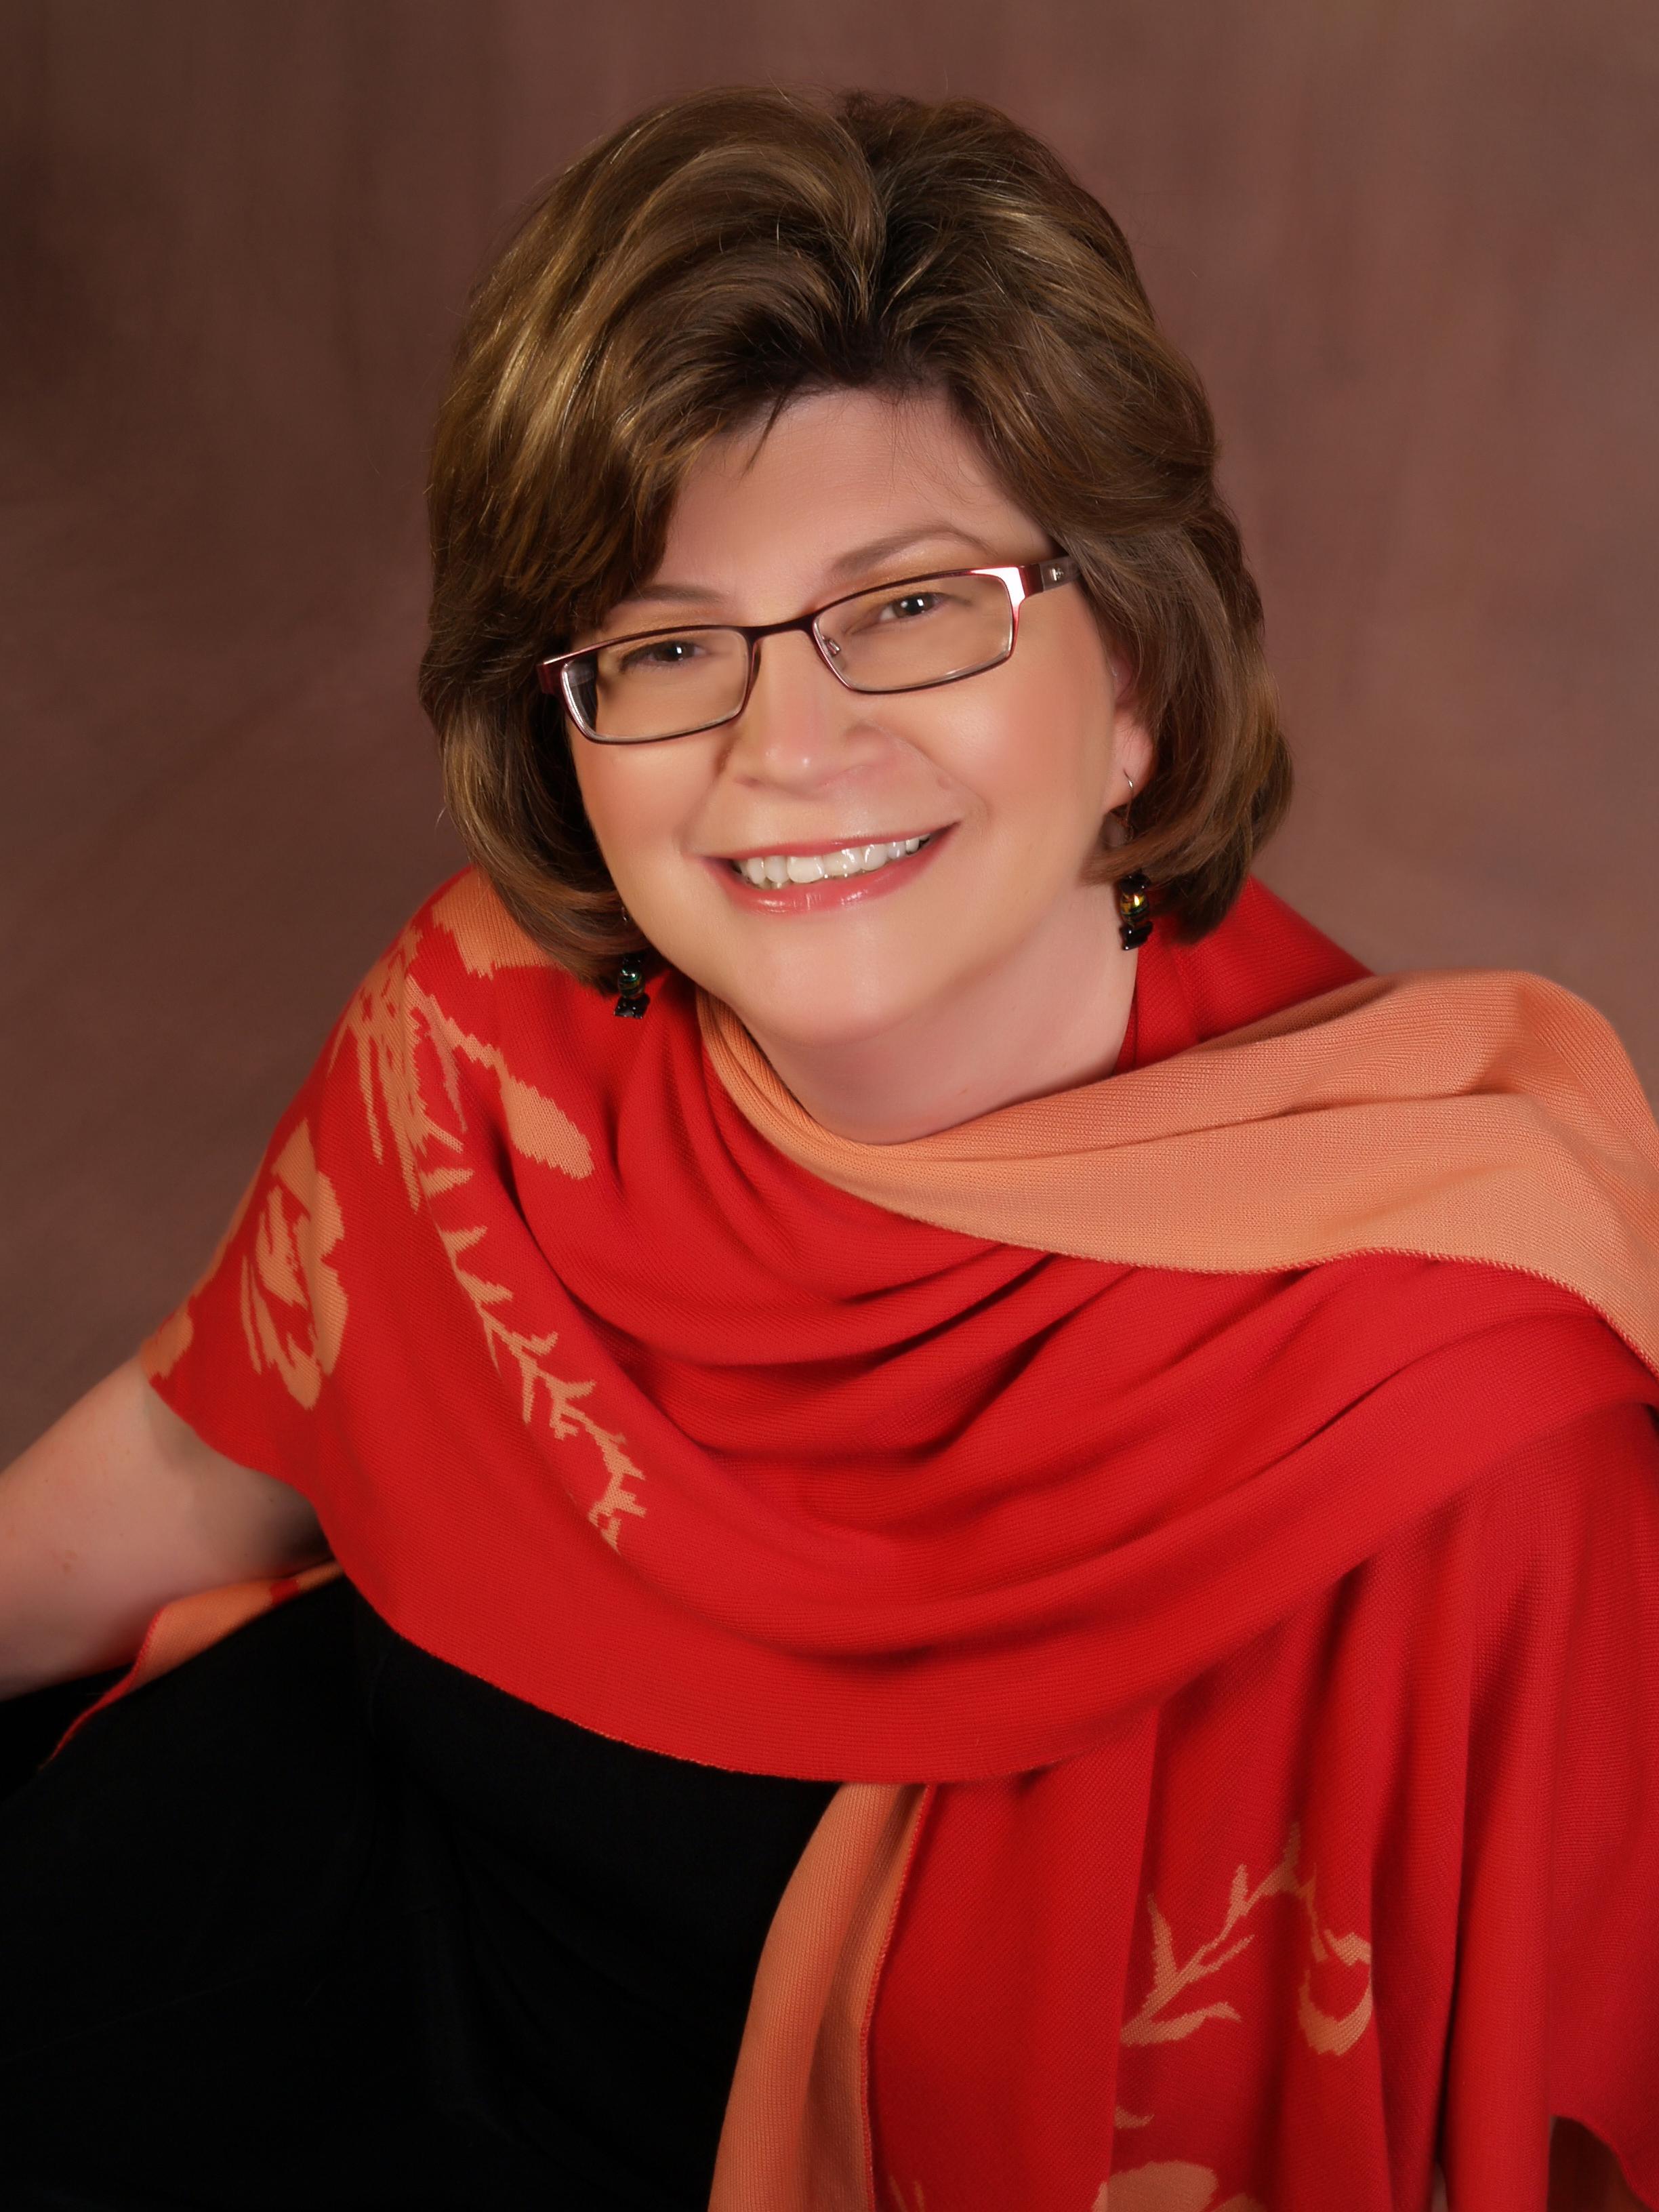 Author Jillian Kent